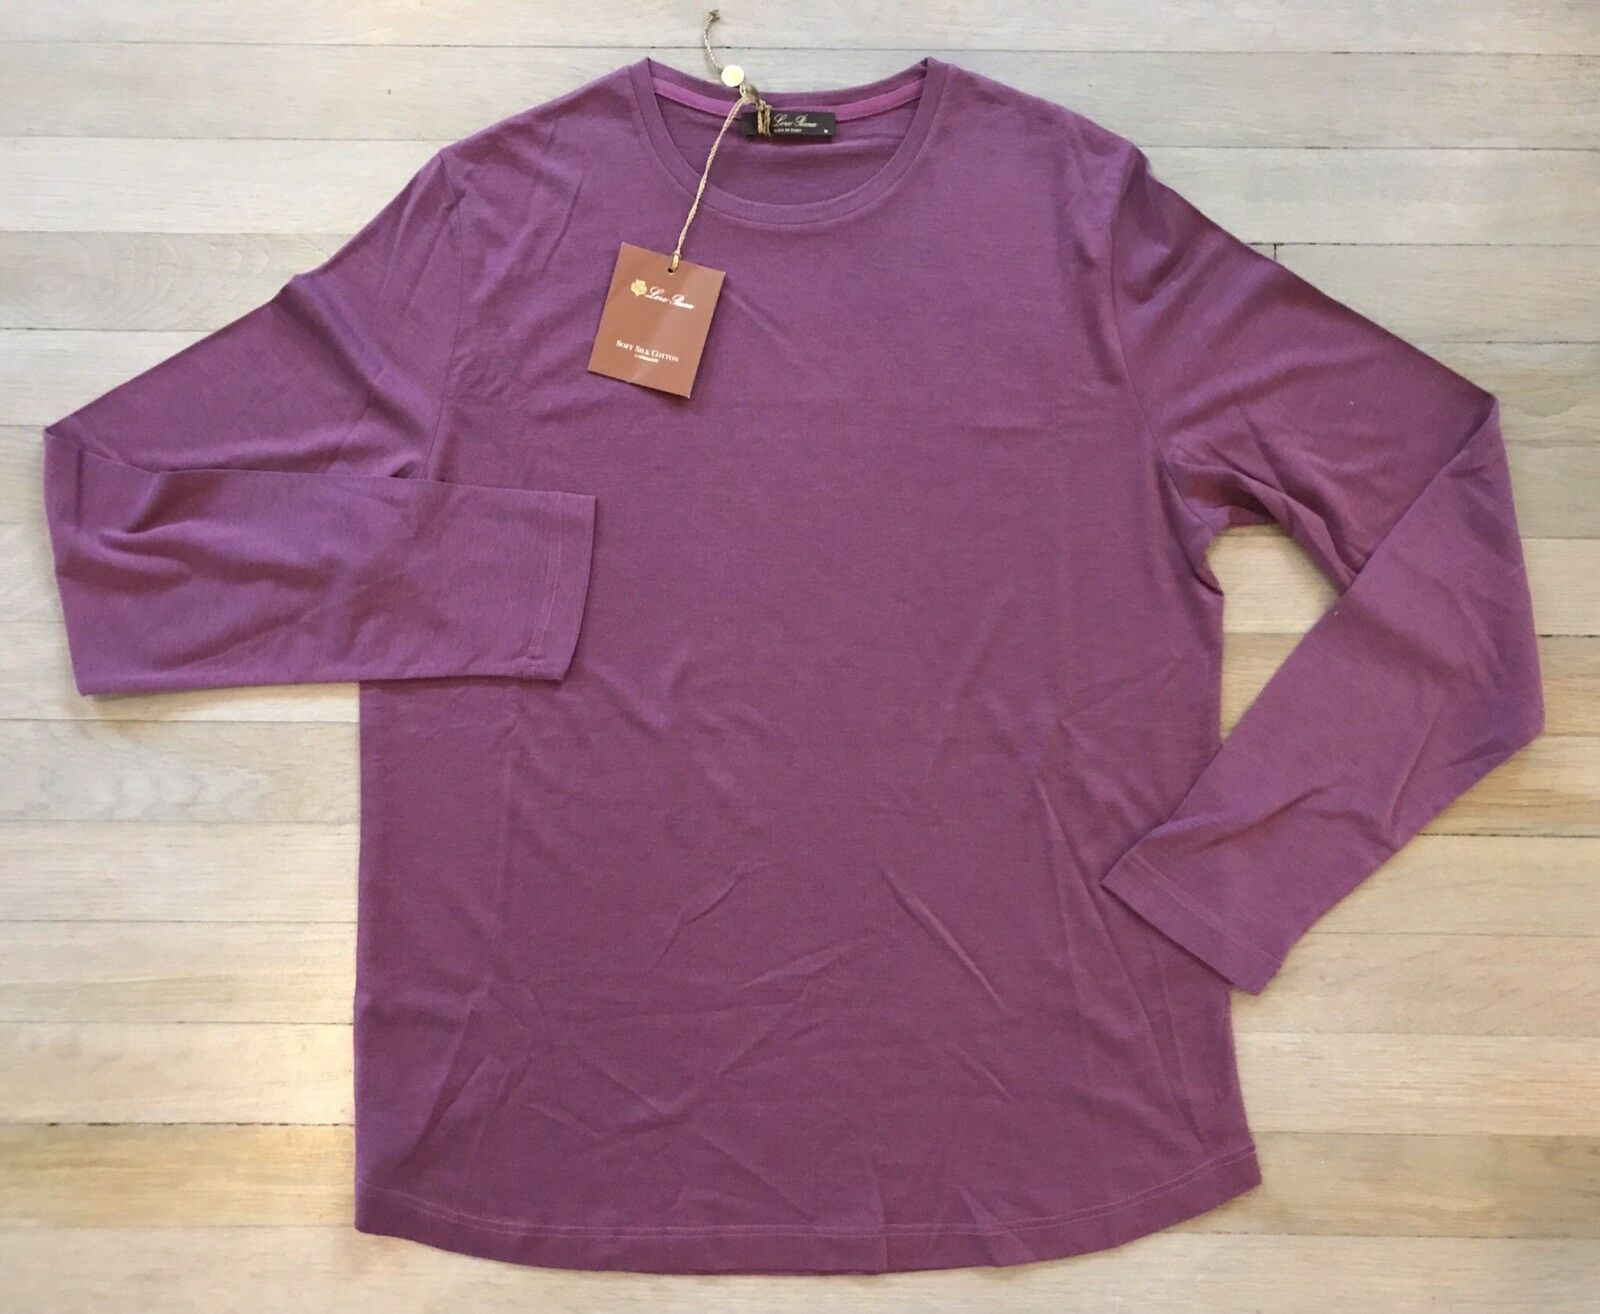 600 Loro Piana Wine Long Sleeve Silk and Cotton Shirt Größe XXXL Made in